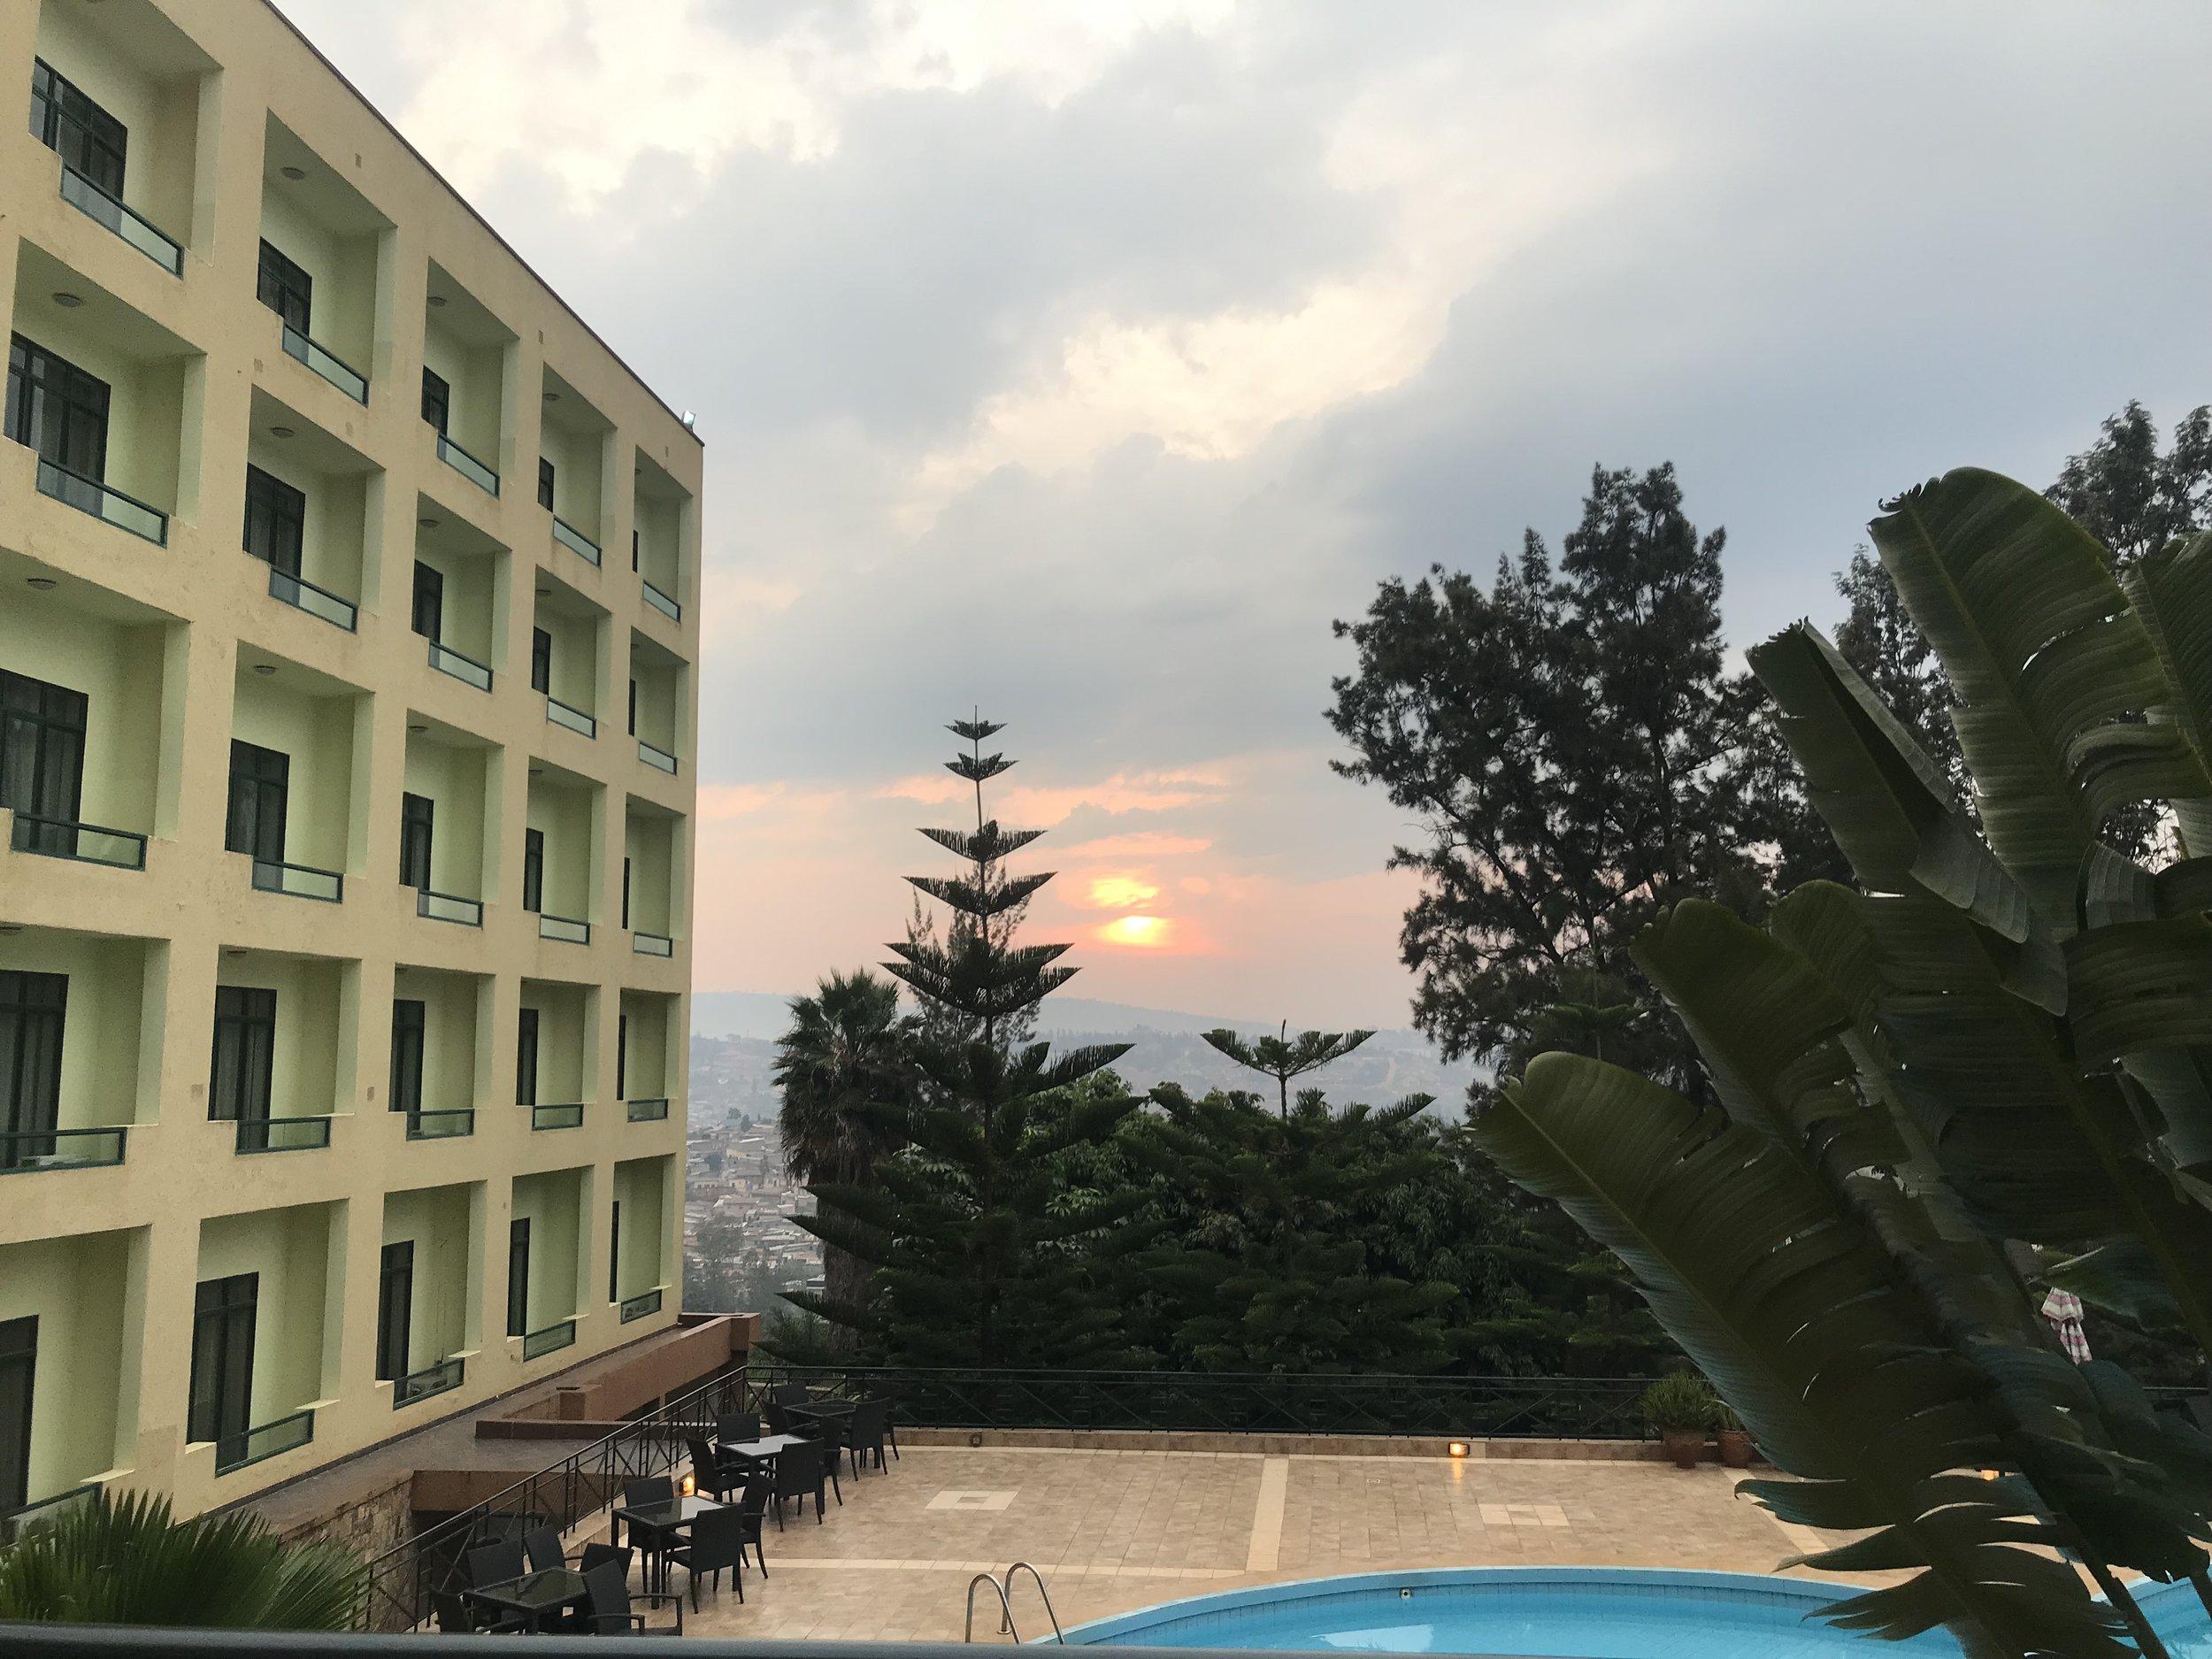 IMG_6261 2VickieRemoe-travel-kigali-rwanda-review-kwibohora25-hotels-africa.JPG